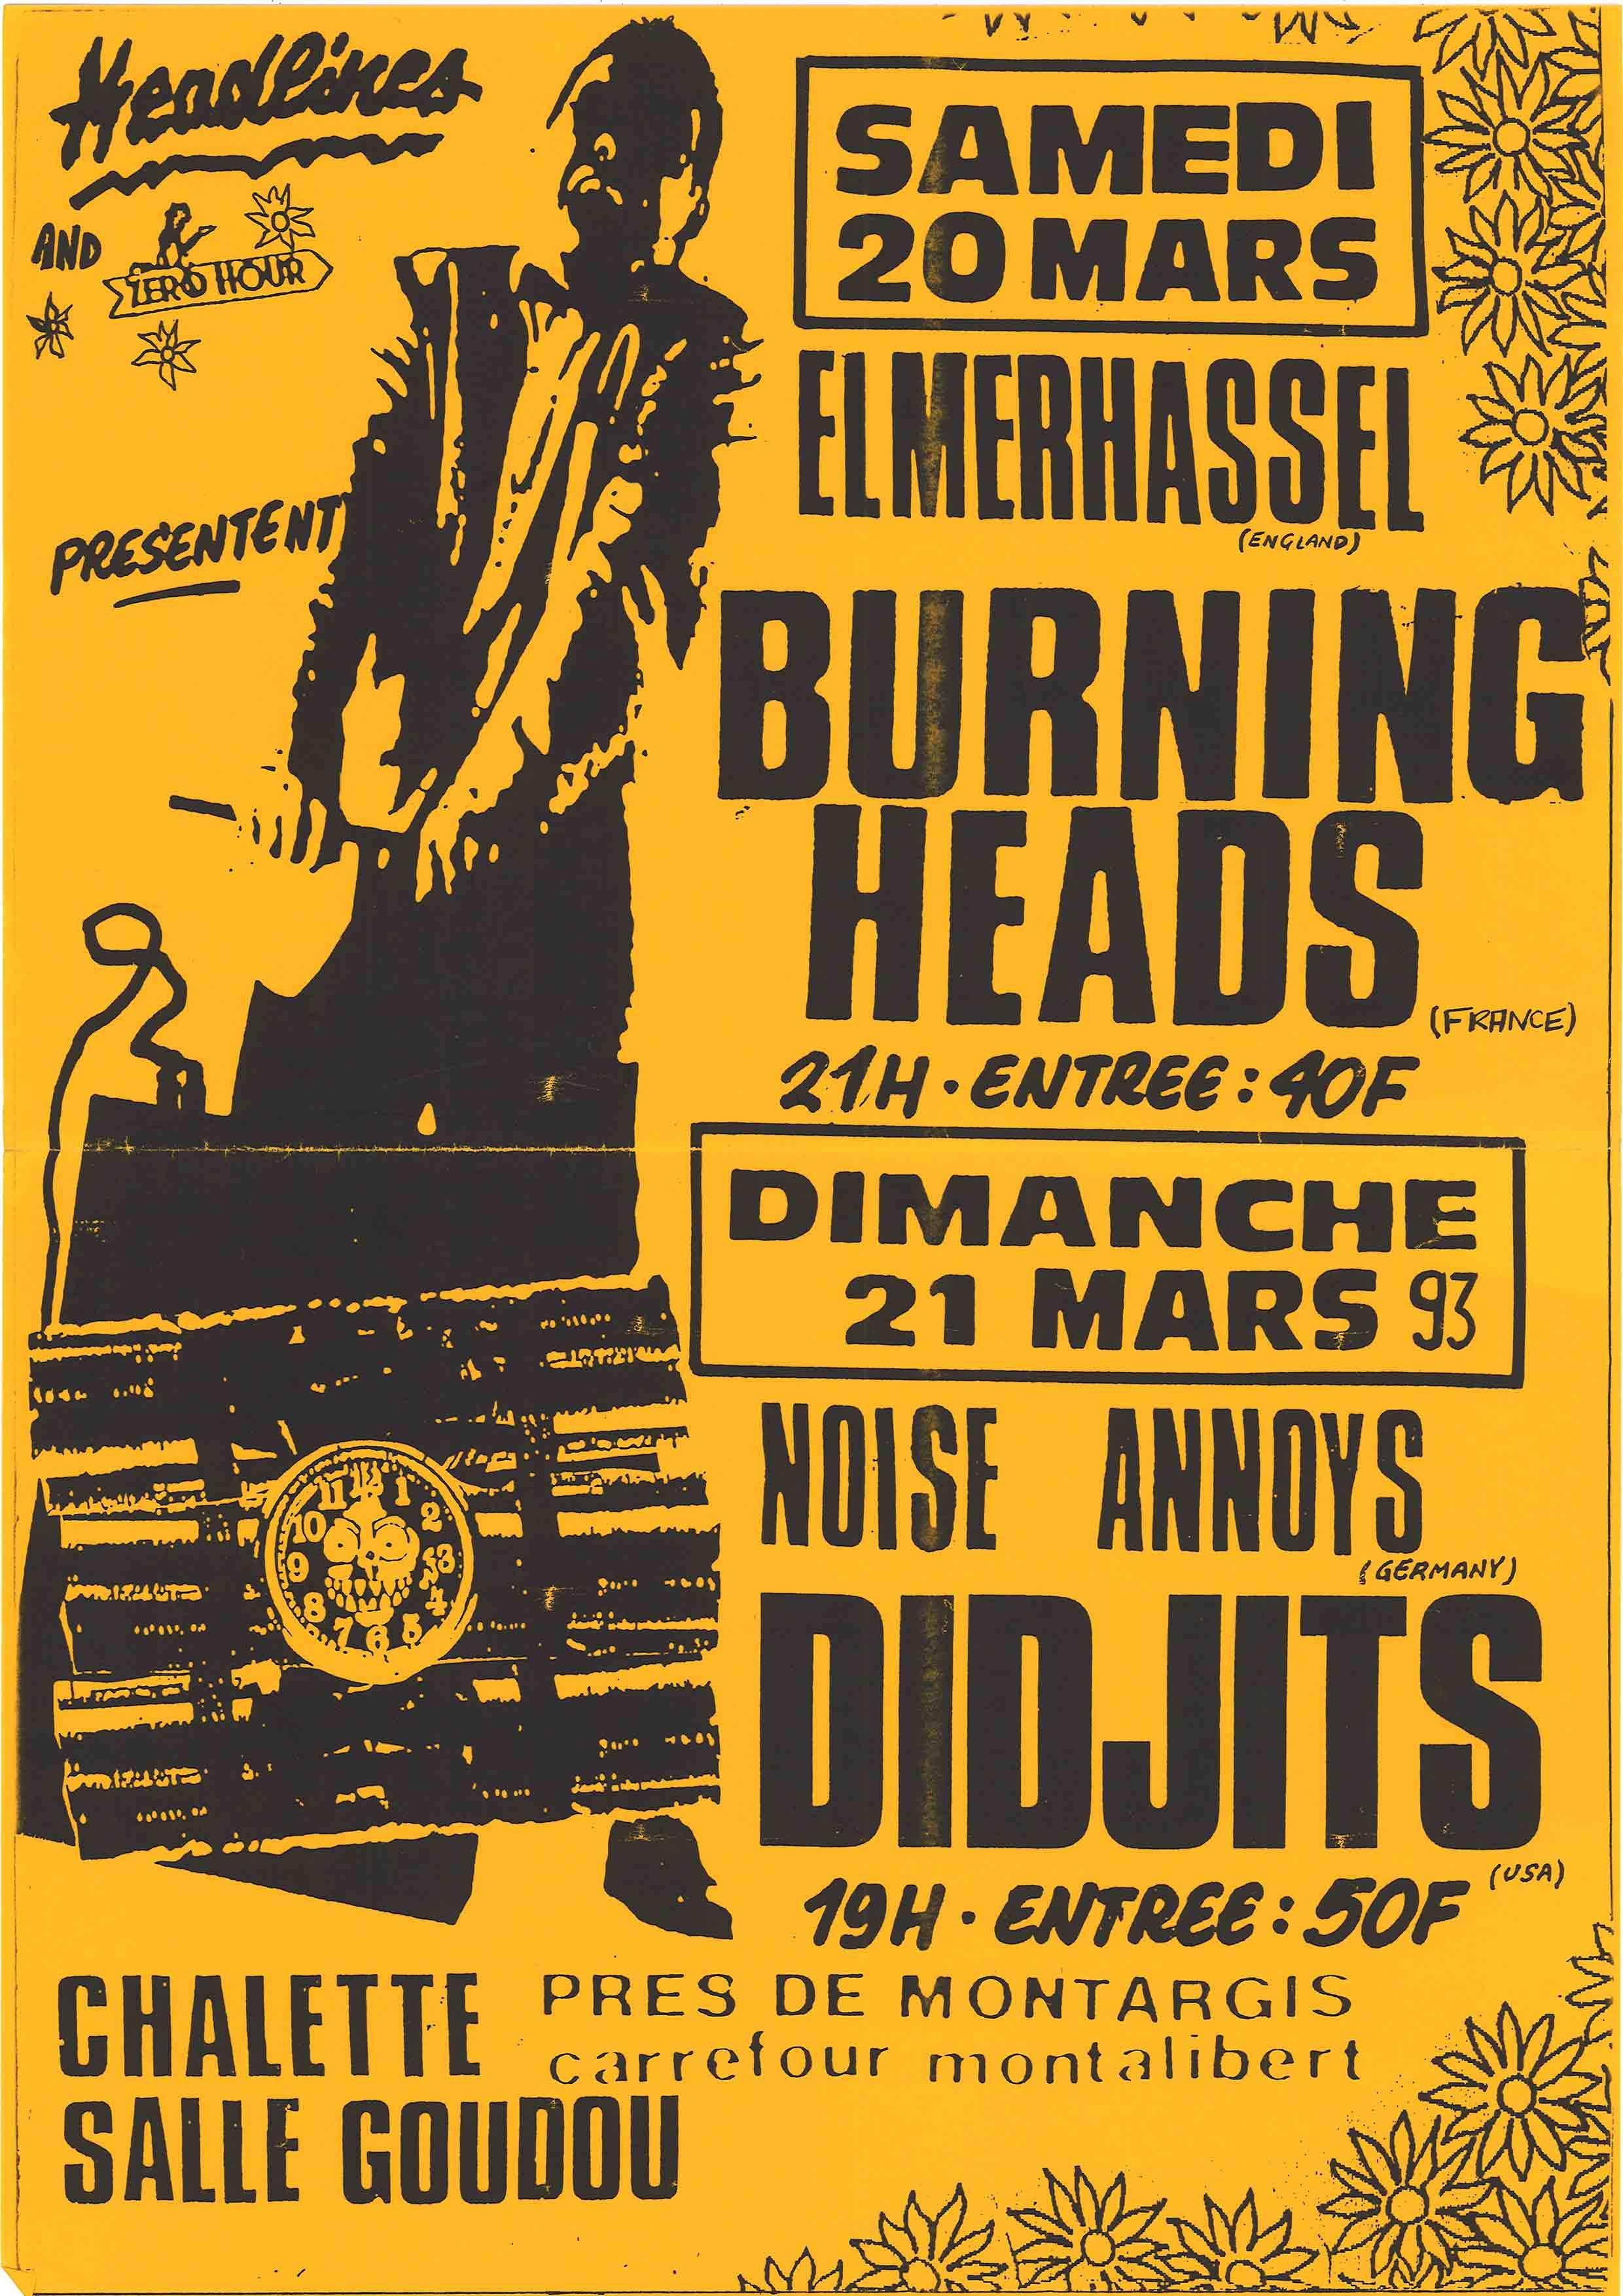 "Samedi 20 mars 1993 Elmerhassel, Burning Heads à Chalette Sur Loing ""Salle Goudou"""